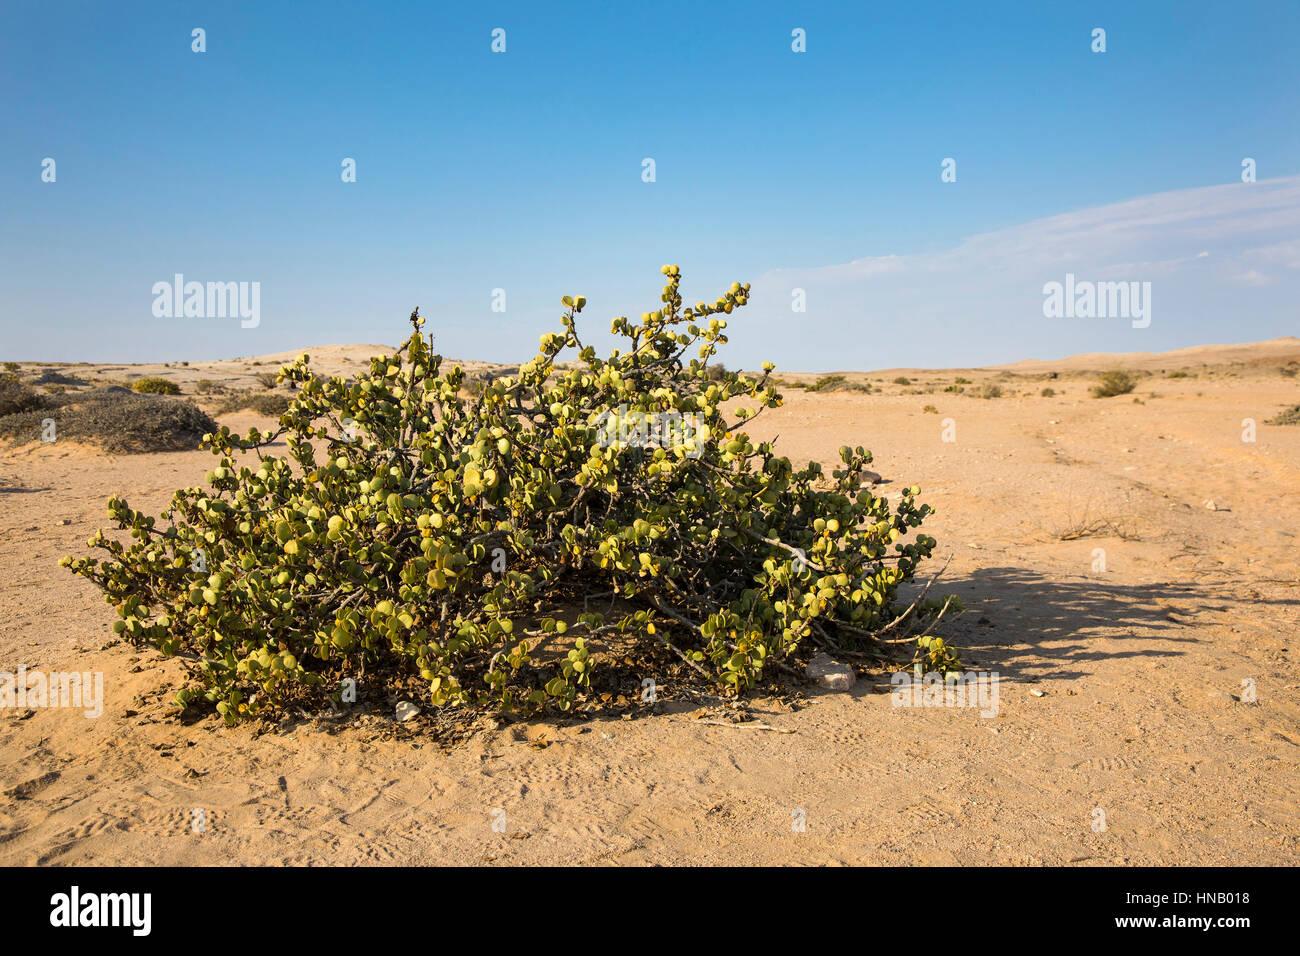 Zygophyllum stapfii, Dollar Bush, Welwitschia Plains, Swakopmund, Namibia, Africa, by Monika Hrdinova/Dembinsky - Stock Image